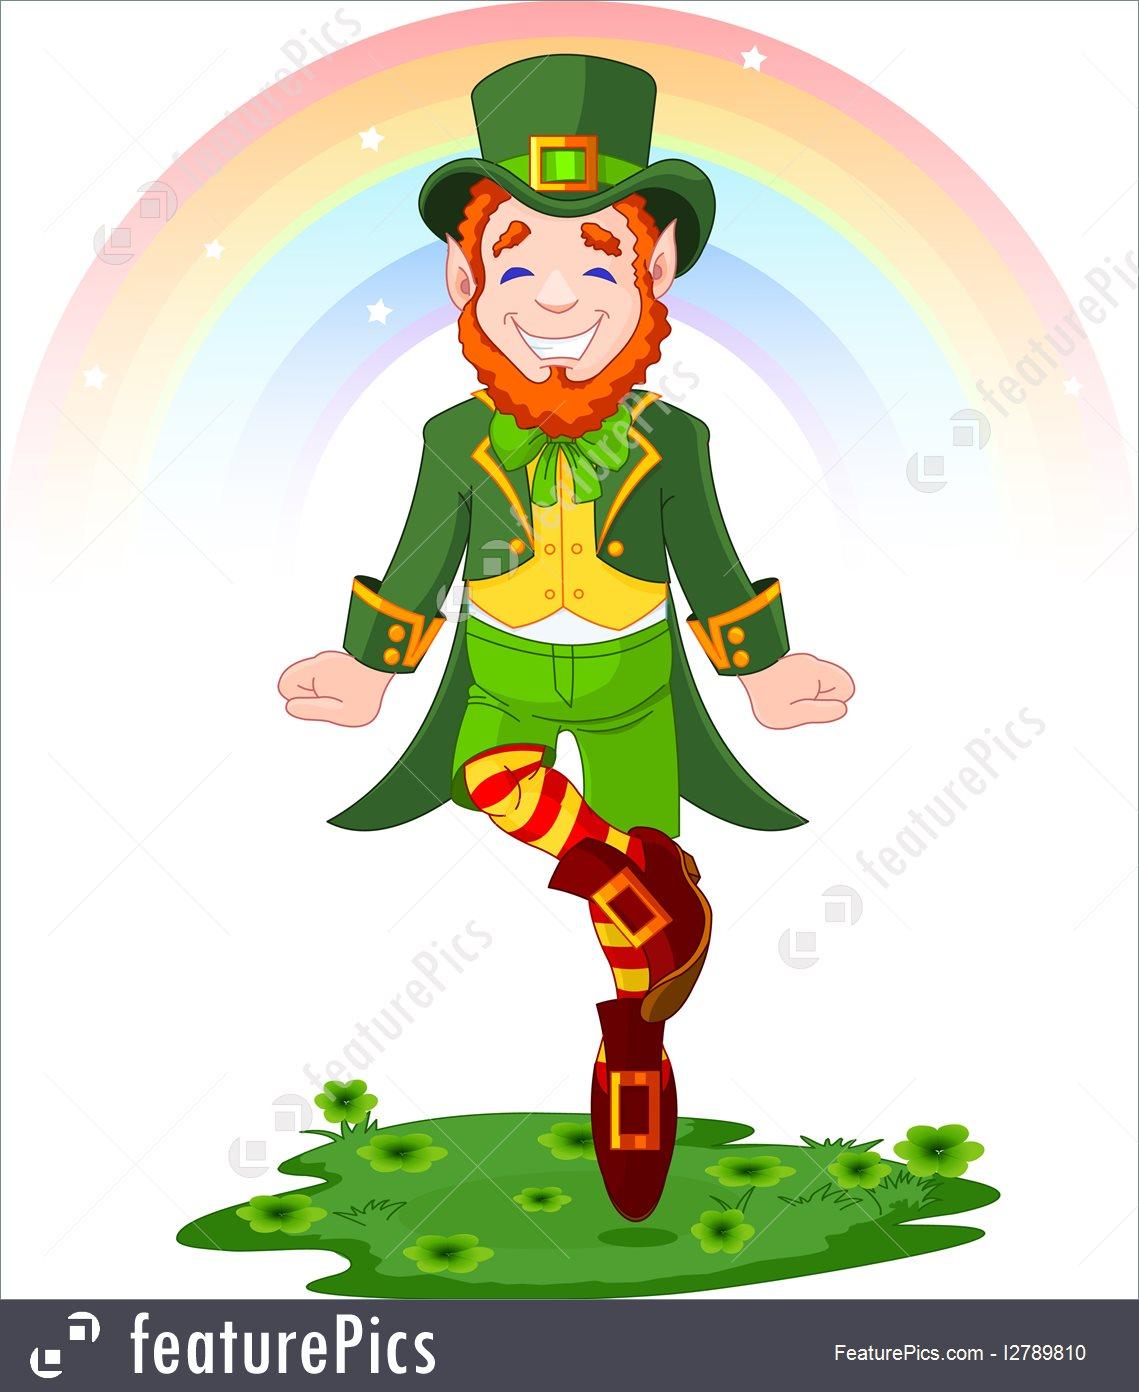 1139x1392 Holidays St. Patrick's Day Lucky Dancing Leprechaun